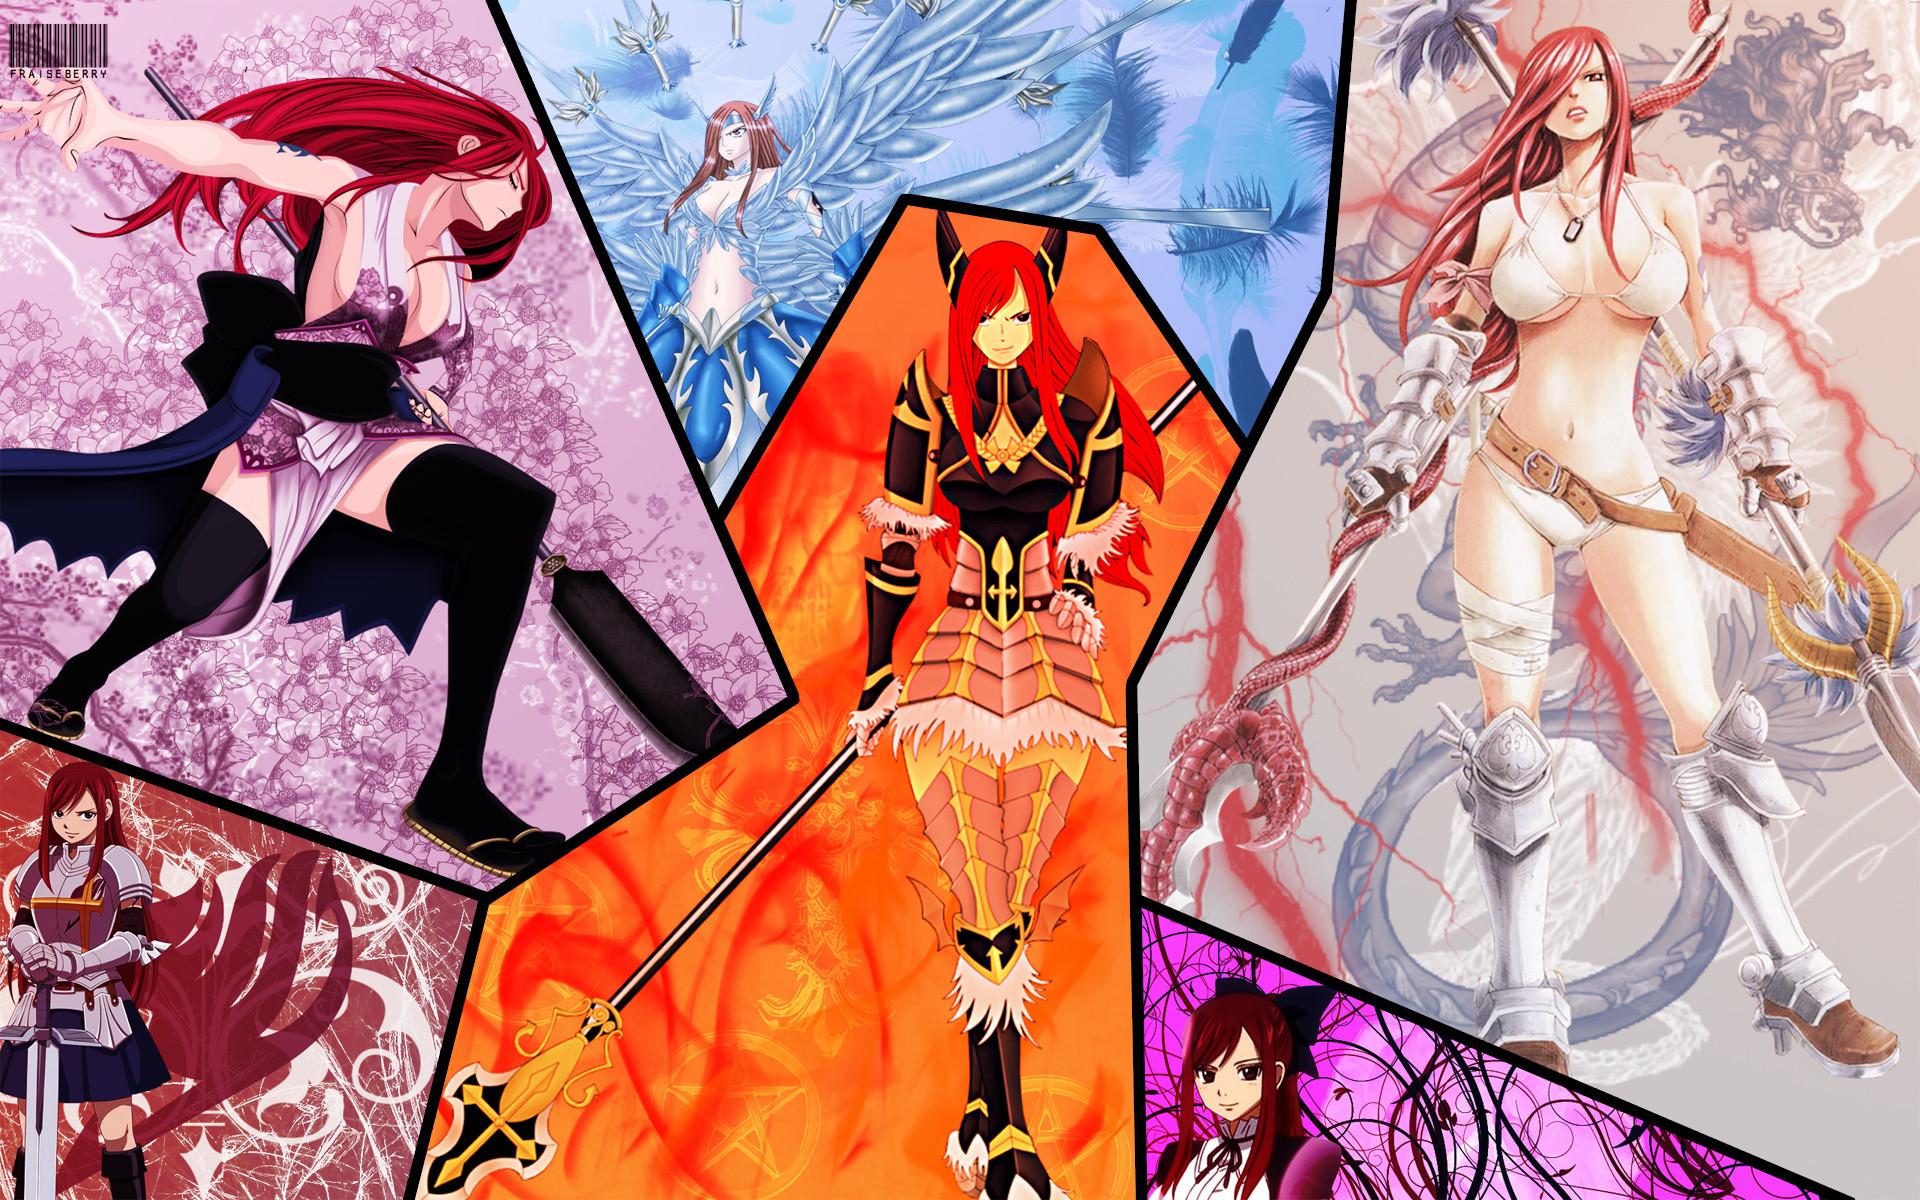 Erza Scarlet Armor Wallpapers As Wallpaper HD